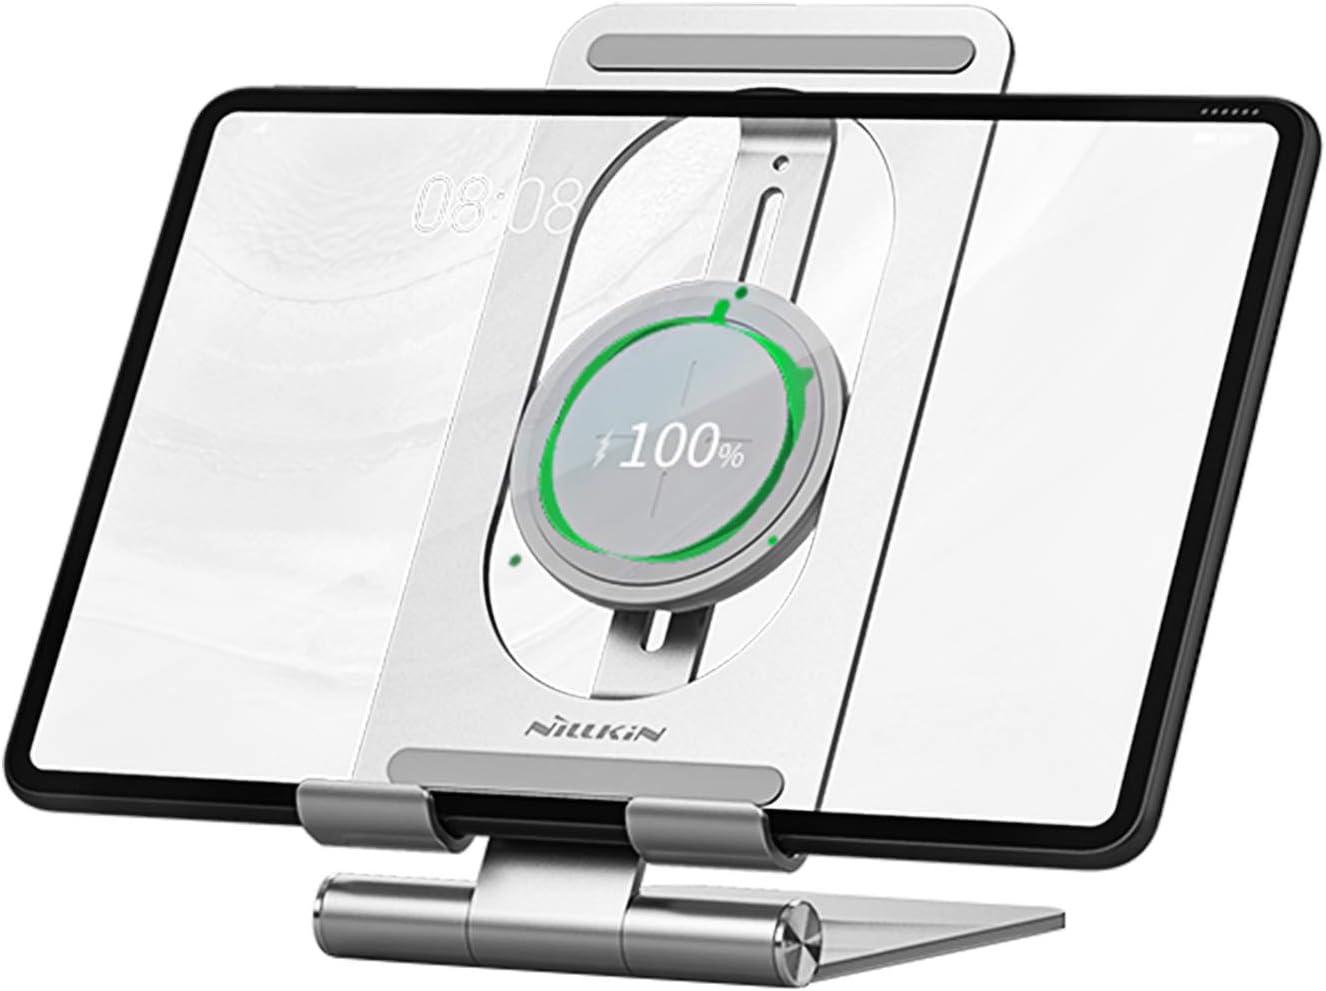 Nillkin Wireless ipad Charger Tablet Stand - 2 in 1 ipad Holder Charging Dock, Wireless Charging Stand for iPad Pro 12.9/iPad Pro 11, ipad 8/7/6/5 Gen, Air 4/3, Mini 4 3 2, Samsung Tab S7/S6/S5e/S4